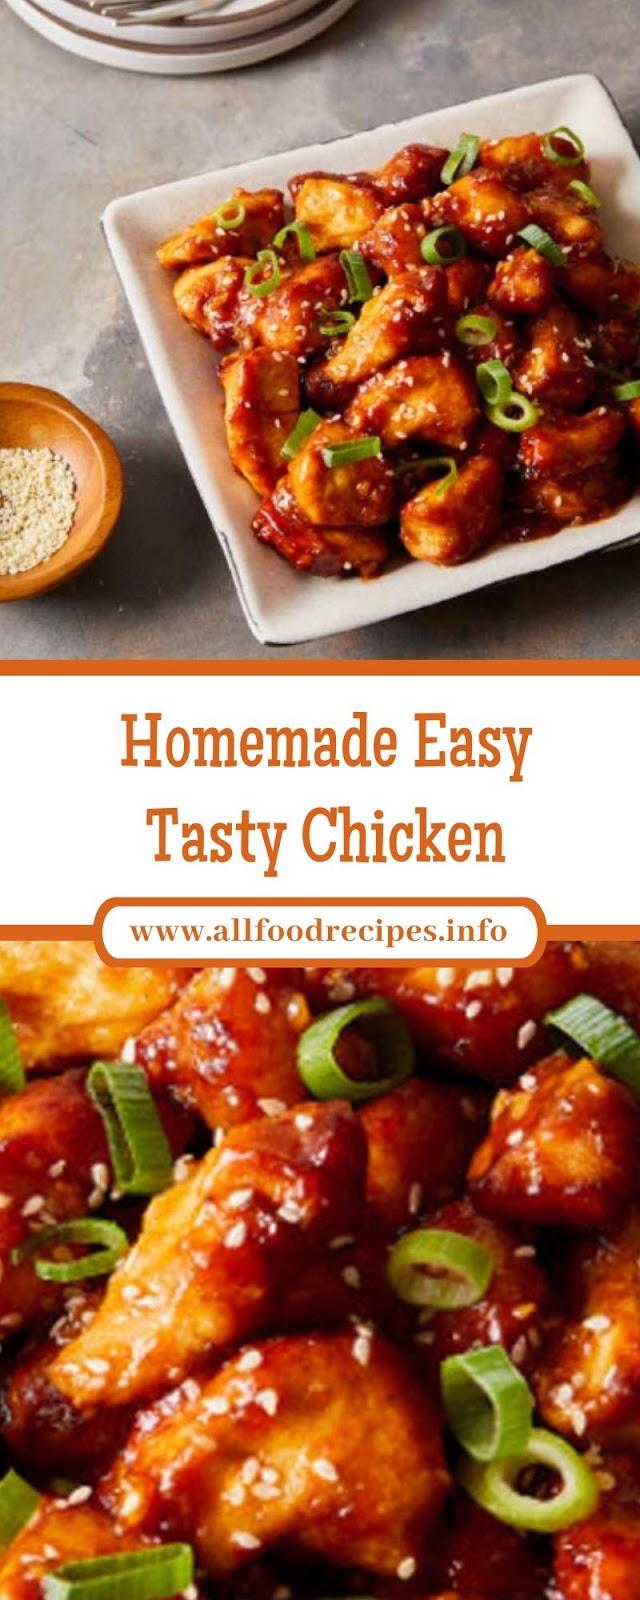 Homemade Easy Tasty Chicken